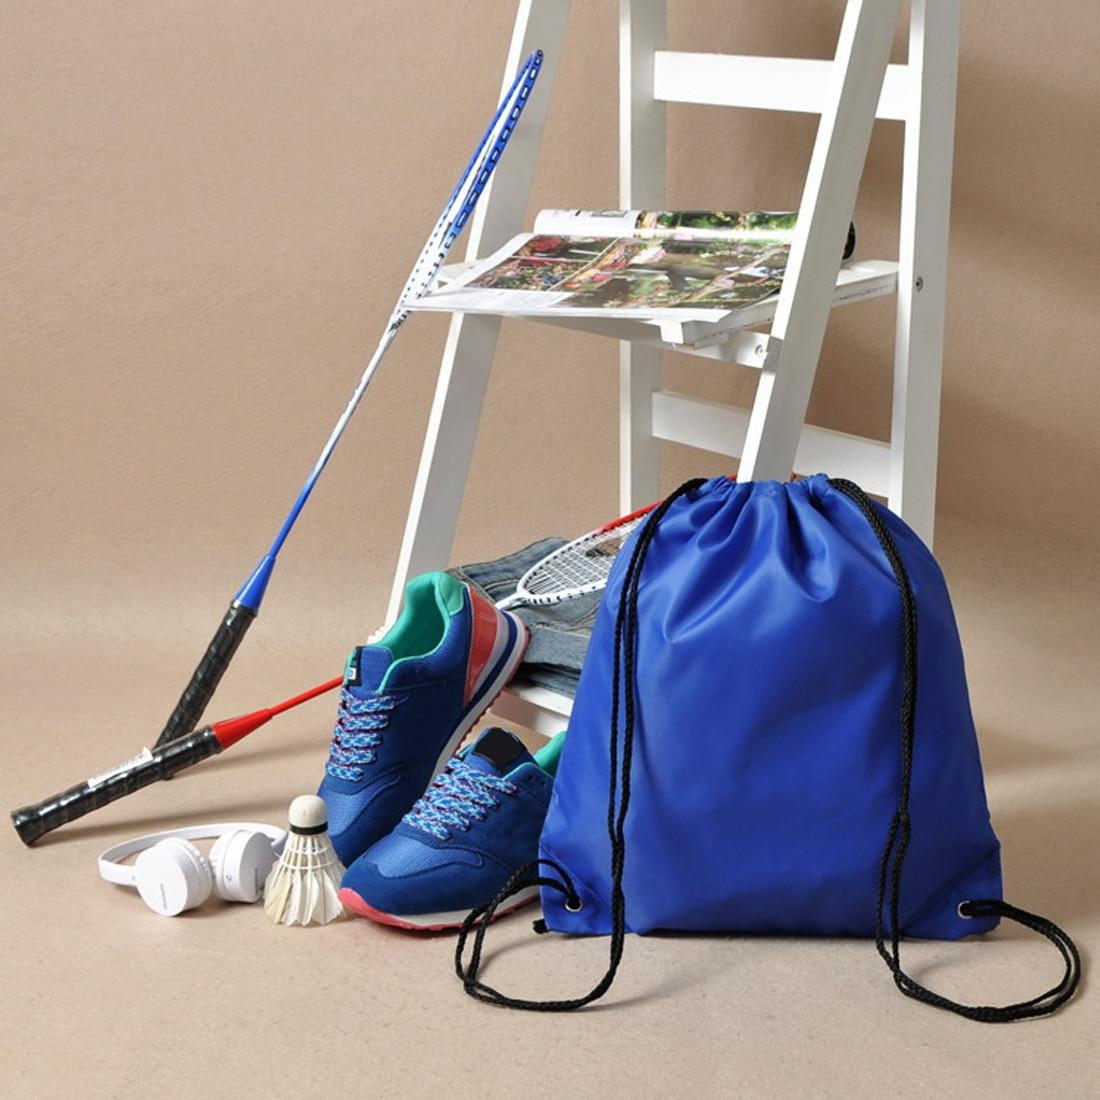 Intelligent Nylon Drawstring Bag Rope String Sack Beach Women Men Travel Storage Package Teenagers Backpack Bundle School Sport Organizer 100% Guarantee Home Storage & Organization Storage Bags